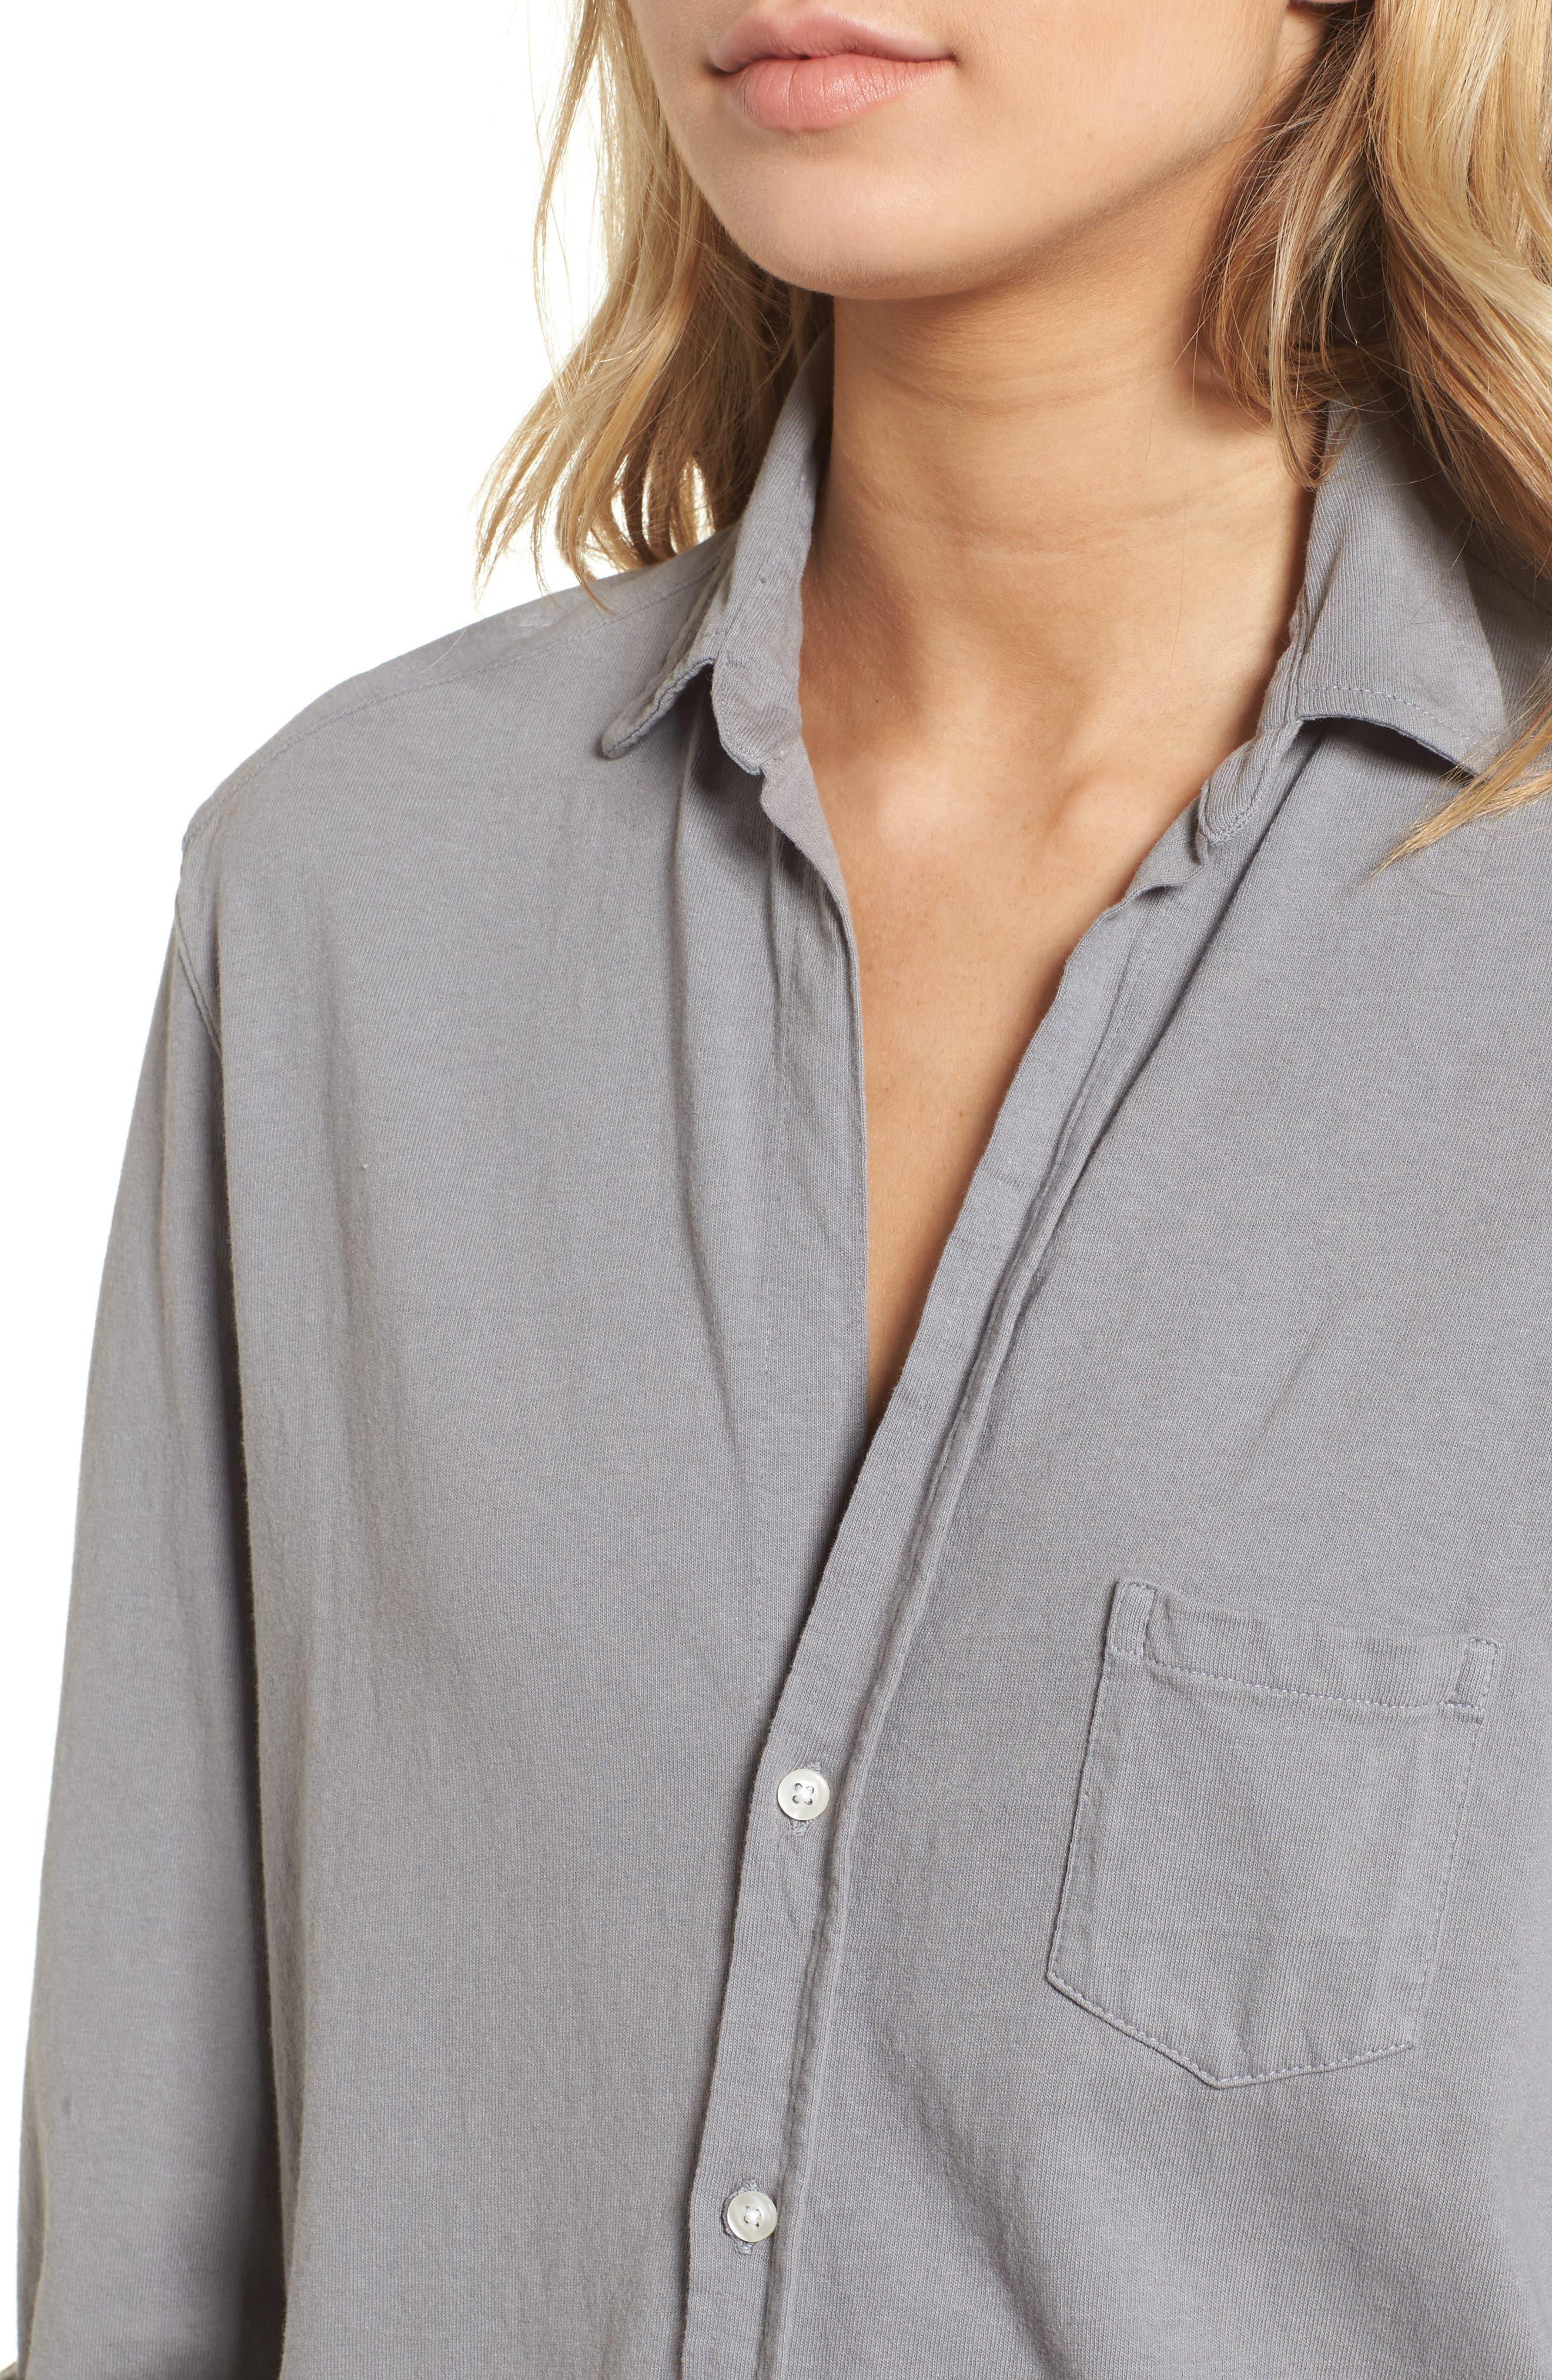 Tee Lab Knit Button Down Shirt,                             Alternate thumbnail 4, color,                             037